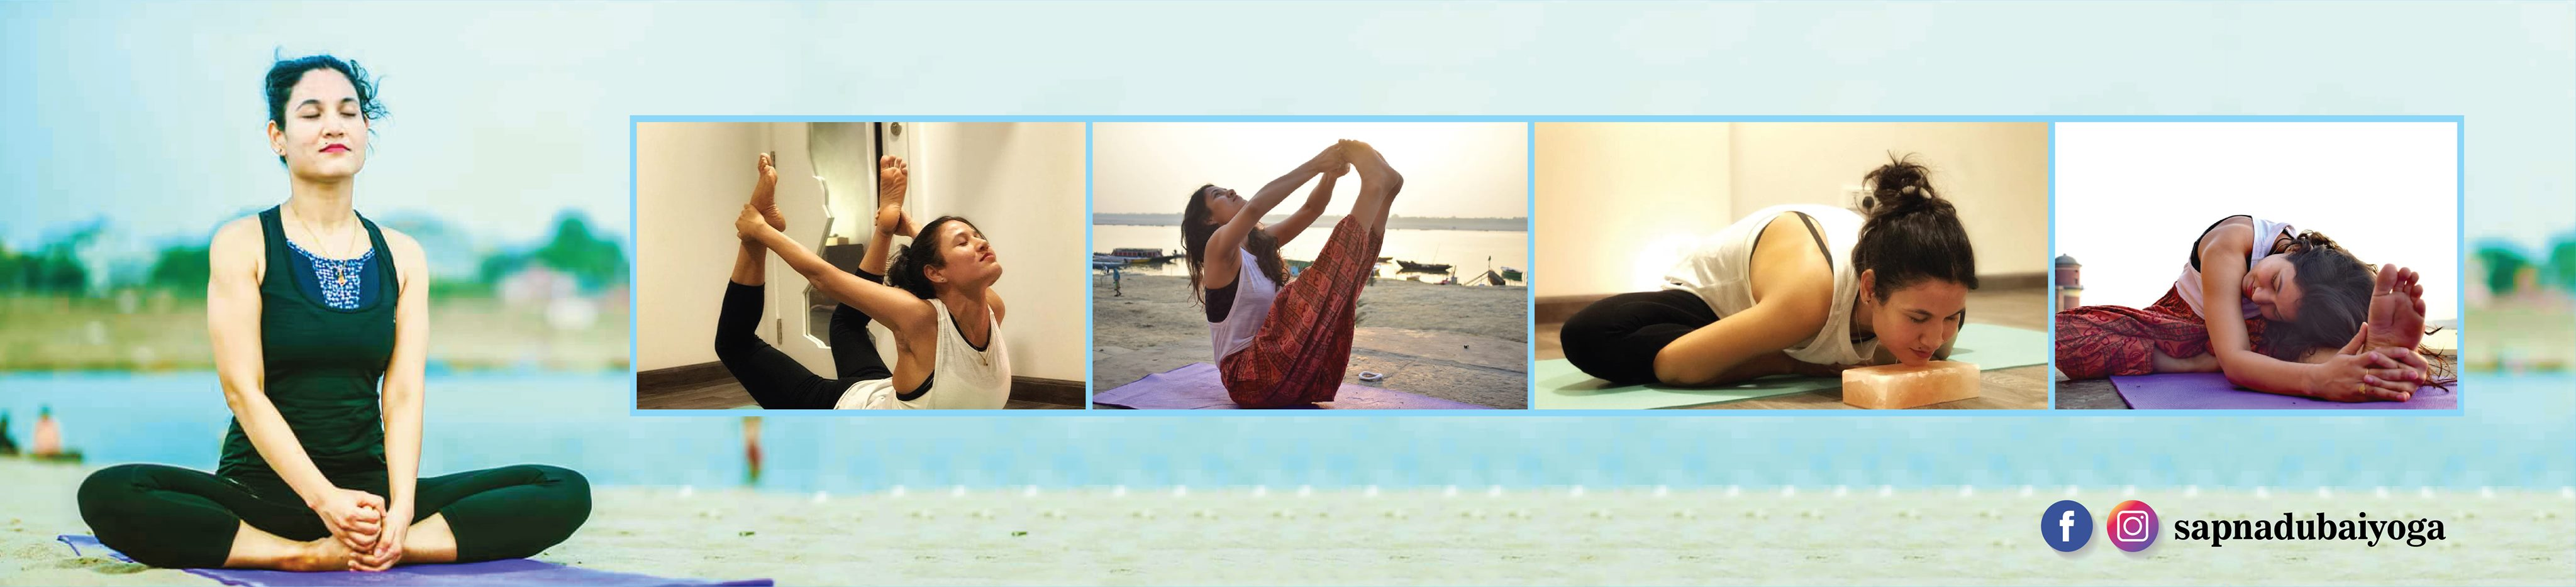 Sapna's Yoga Diary